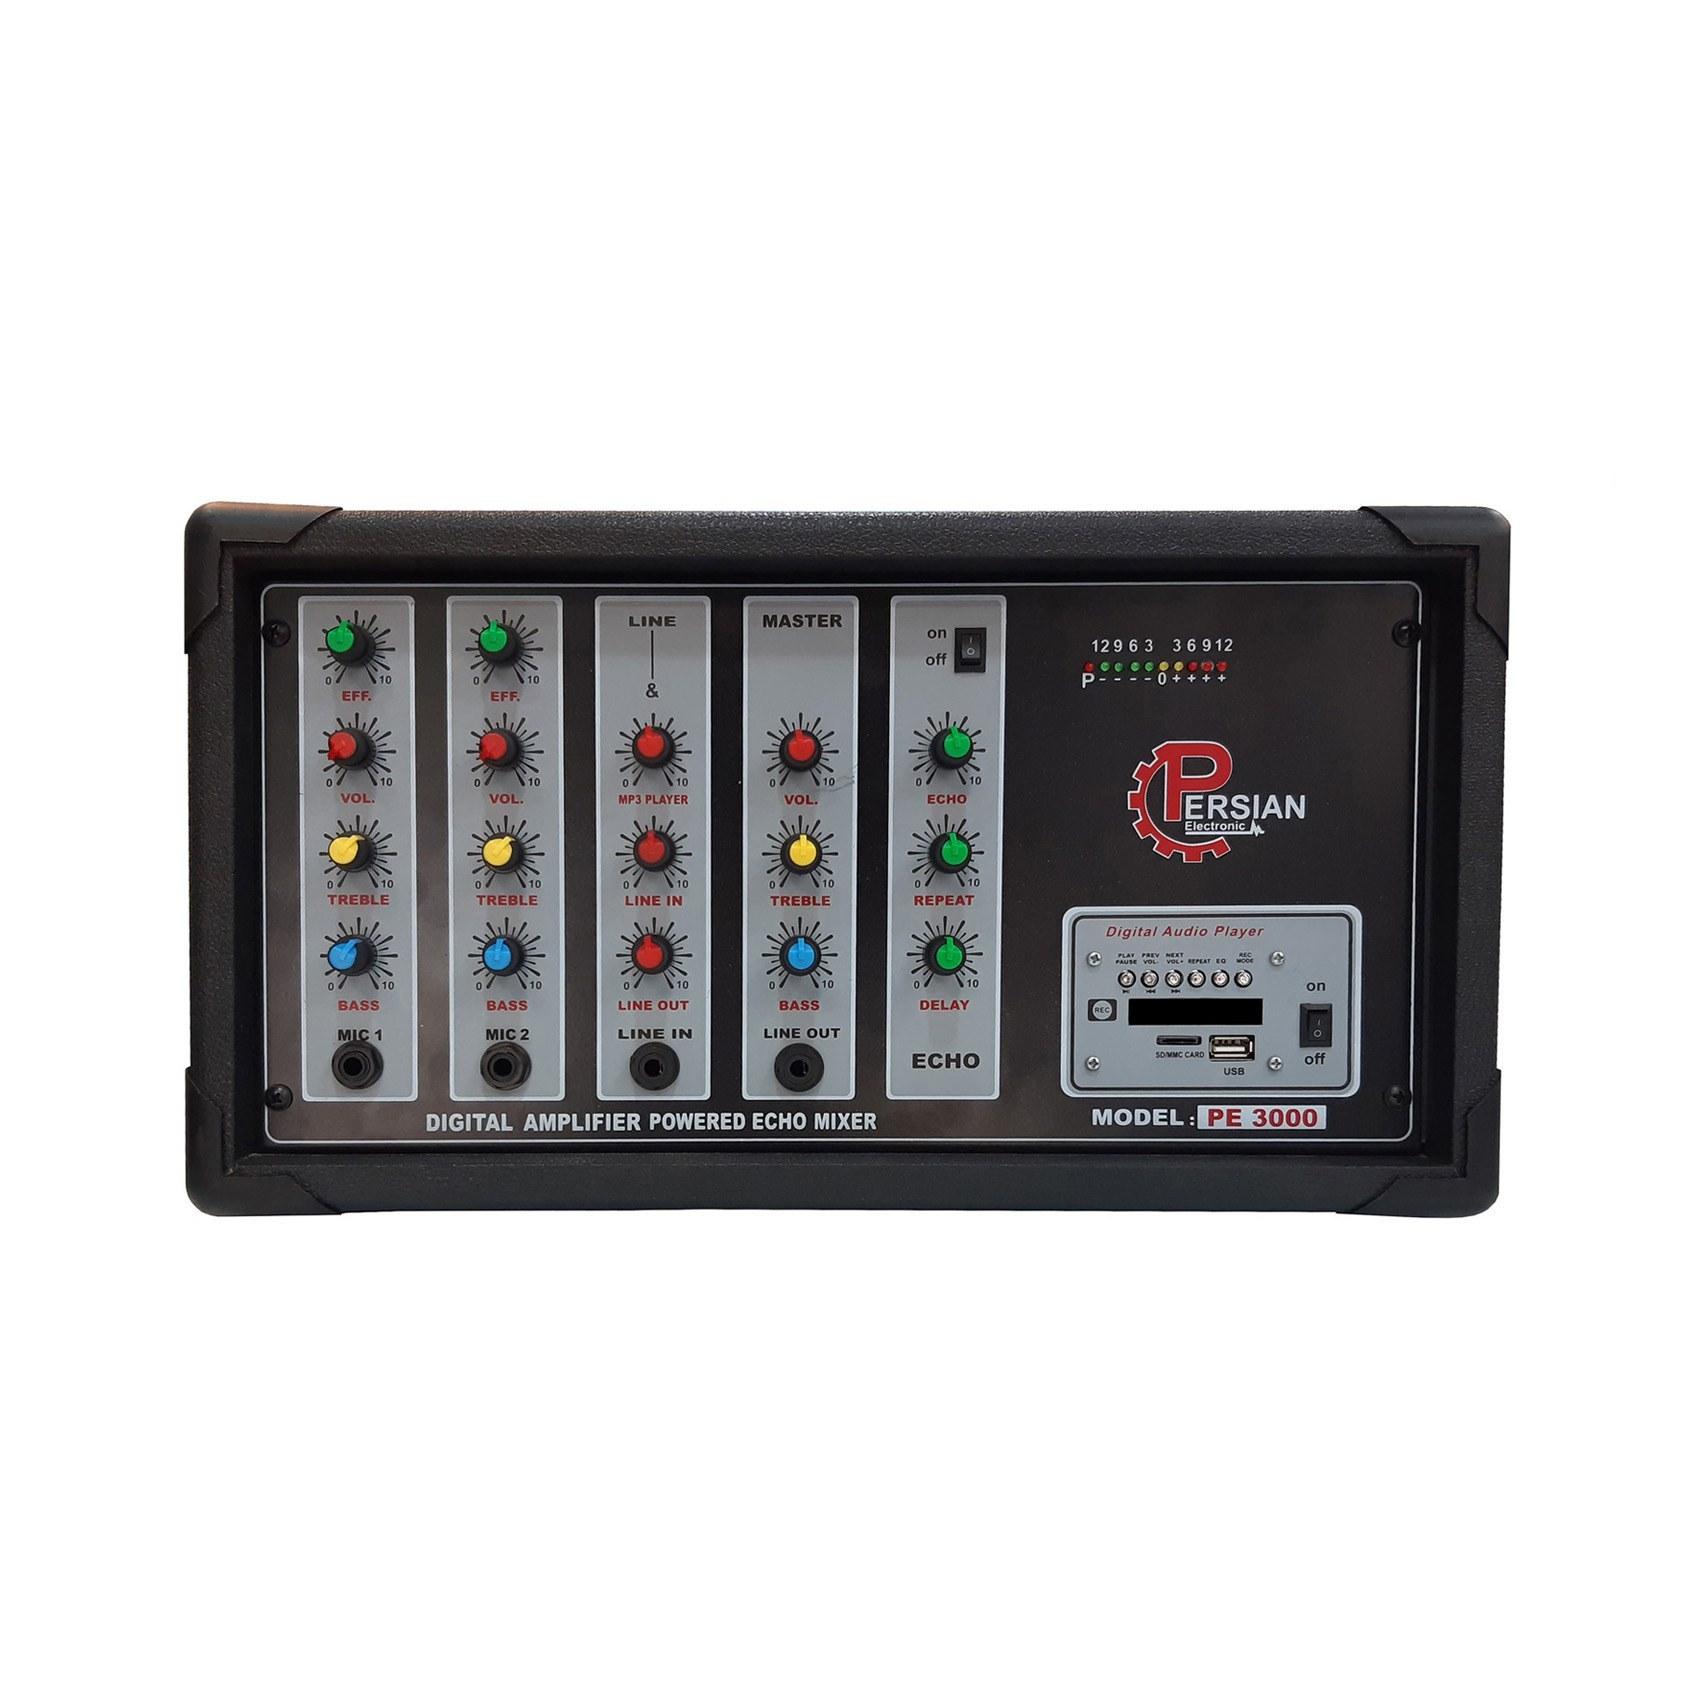 عکس اکوآمپلی فایر پرشین مدل PE3000  اکوامپلی-فایر-پرشین-مدل-pe3000